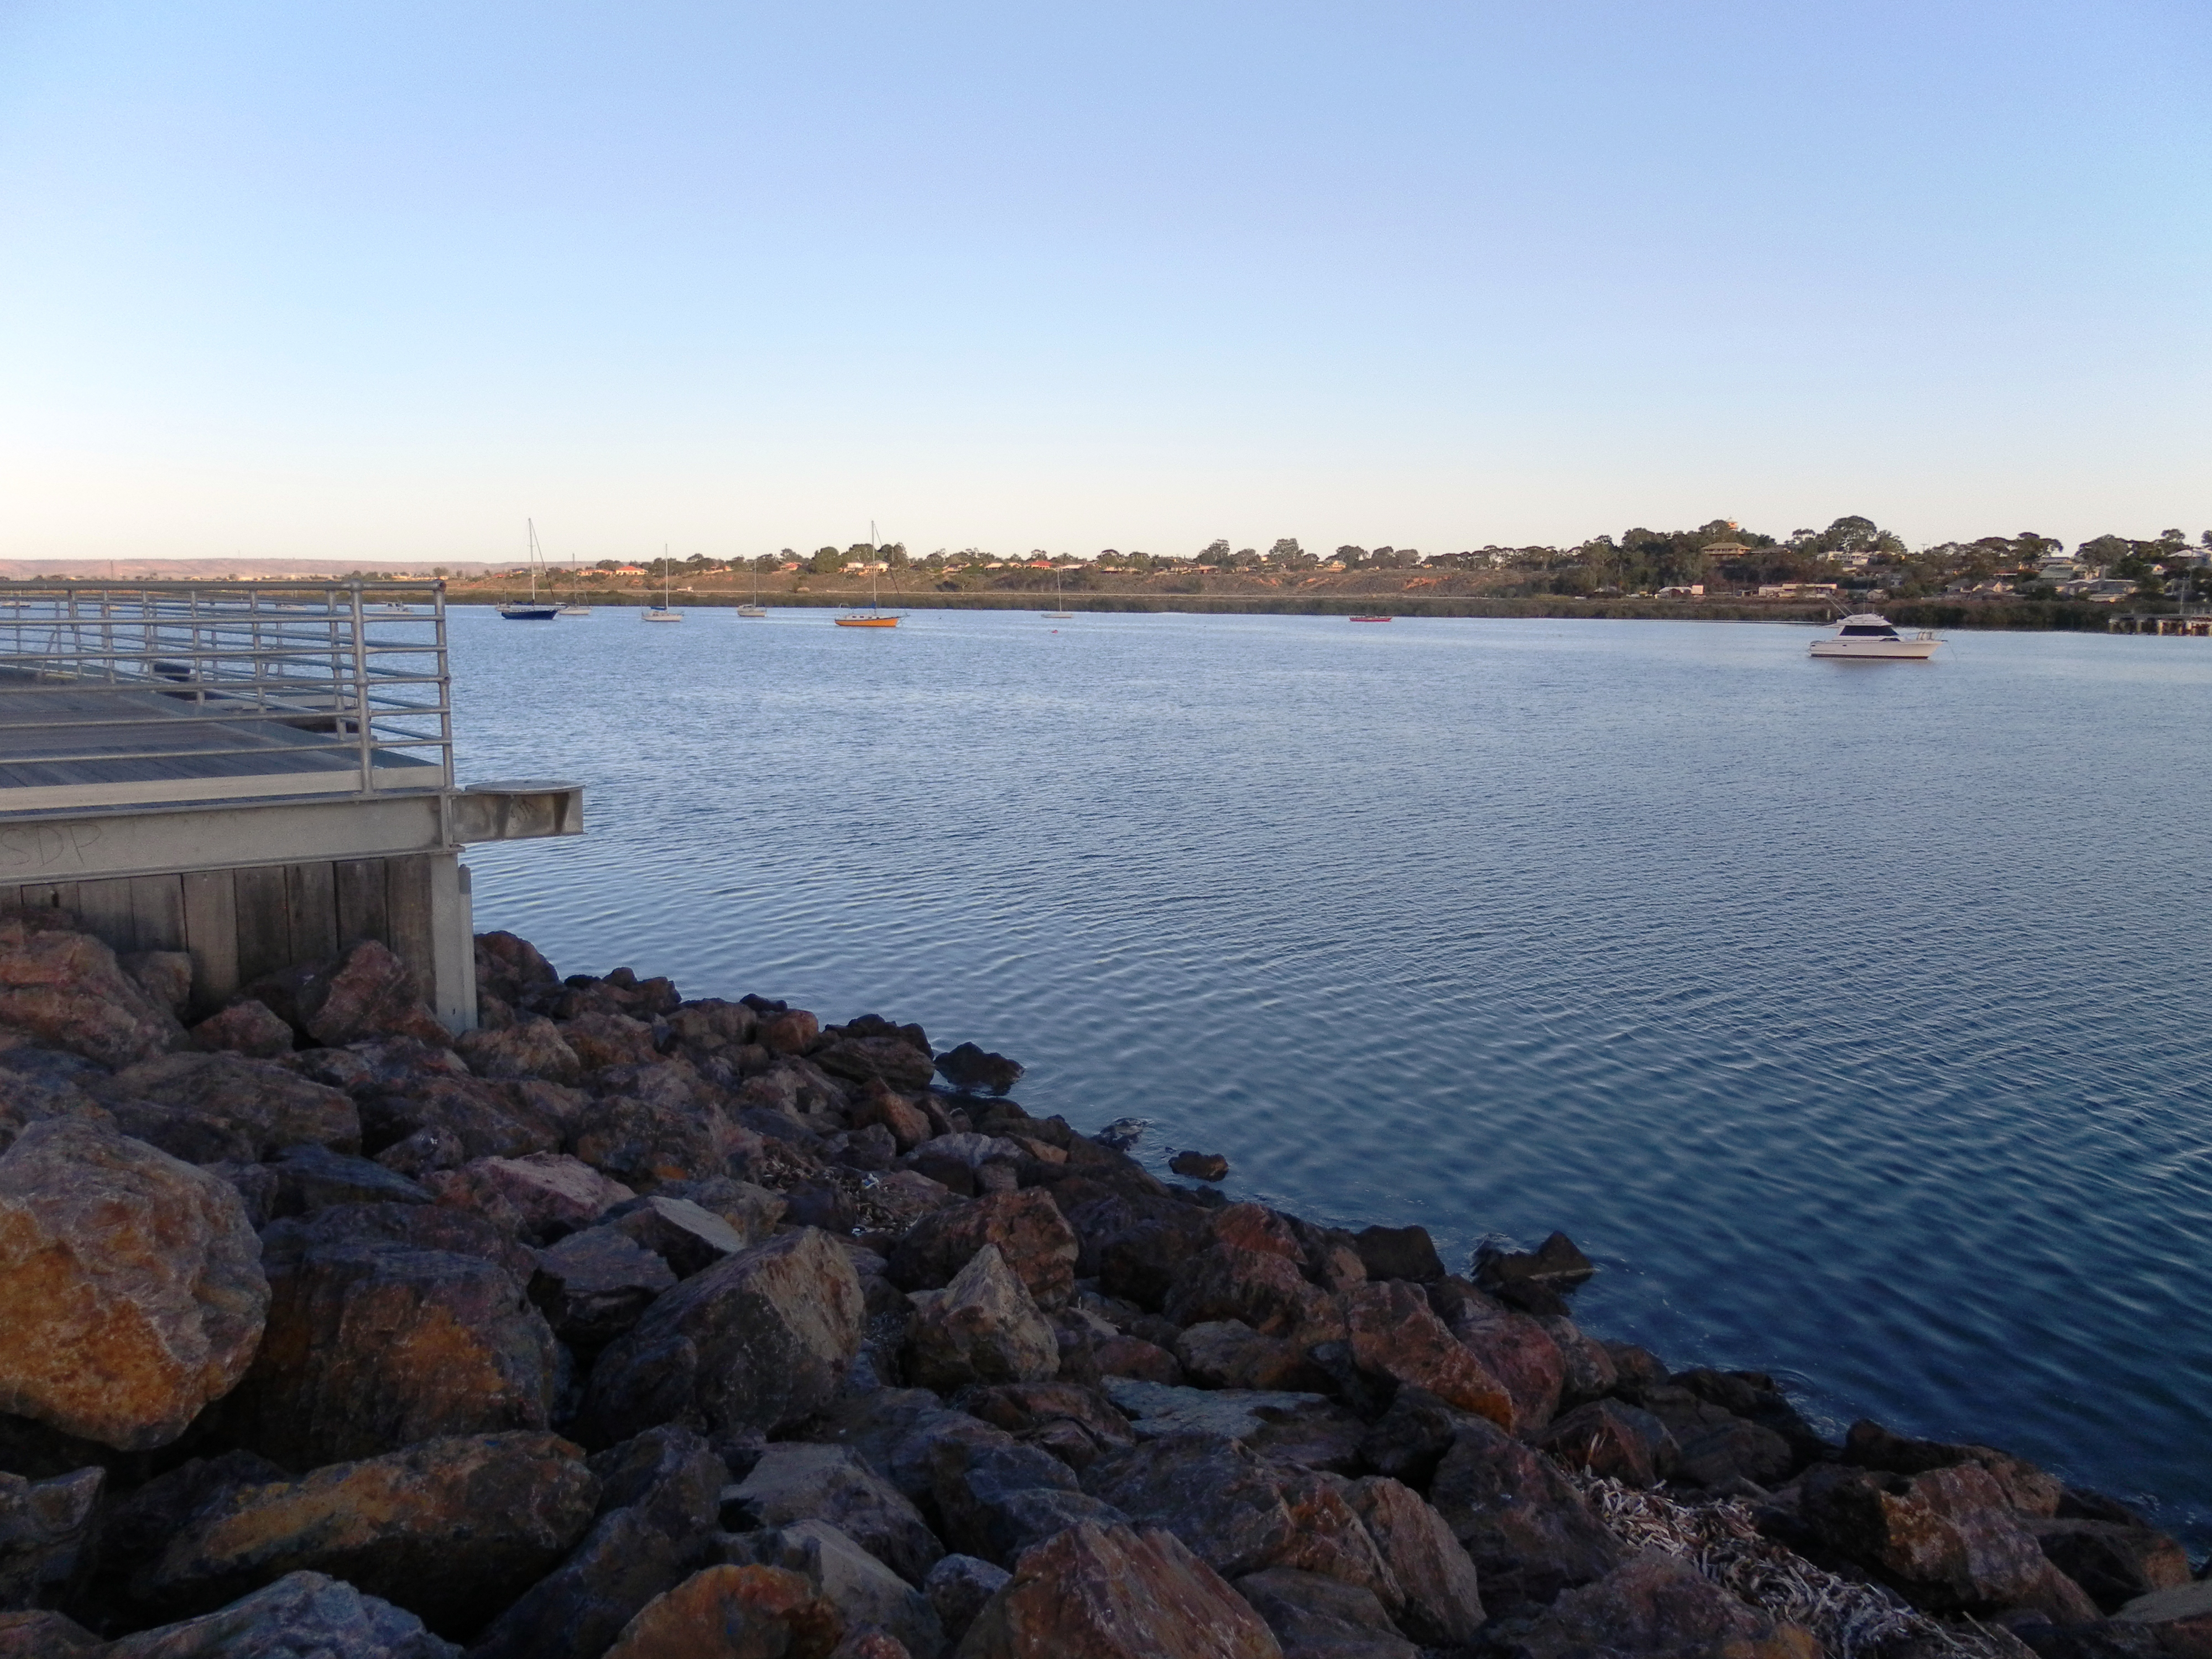 Port Augusta Australia  City pictures : Port Augusta Wharf – A few Salmon – 18/19 April 2012 | Landangler ...